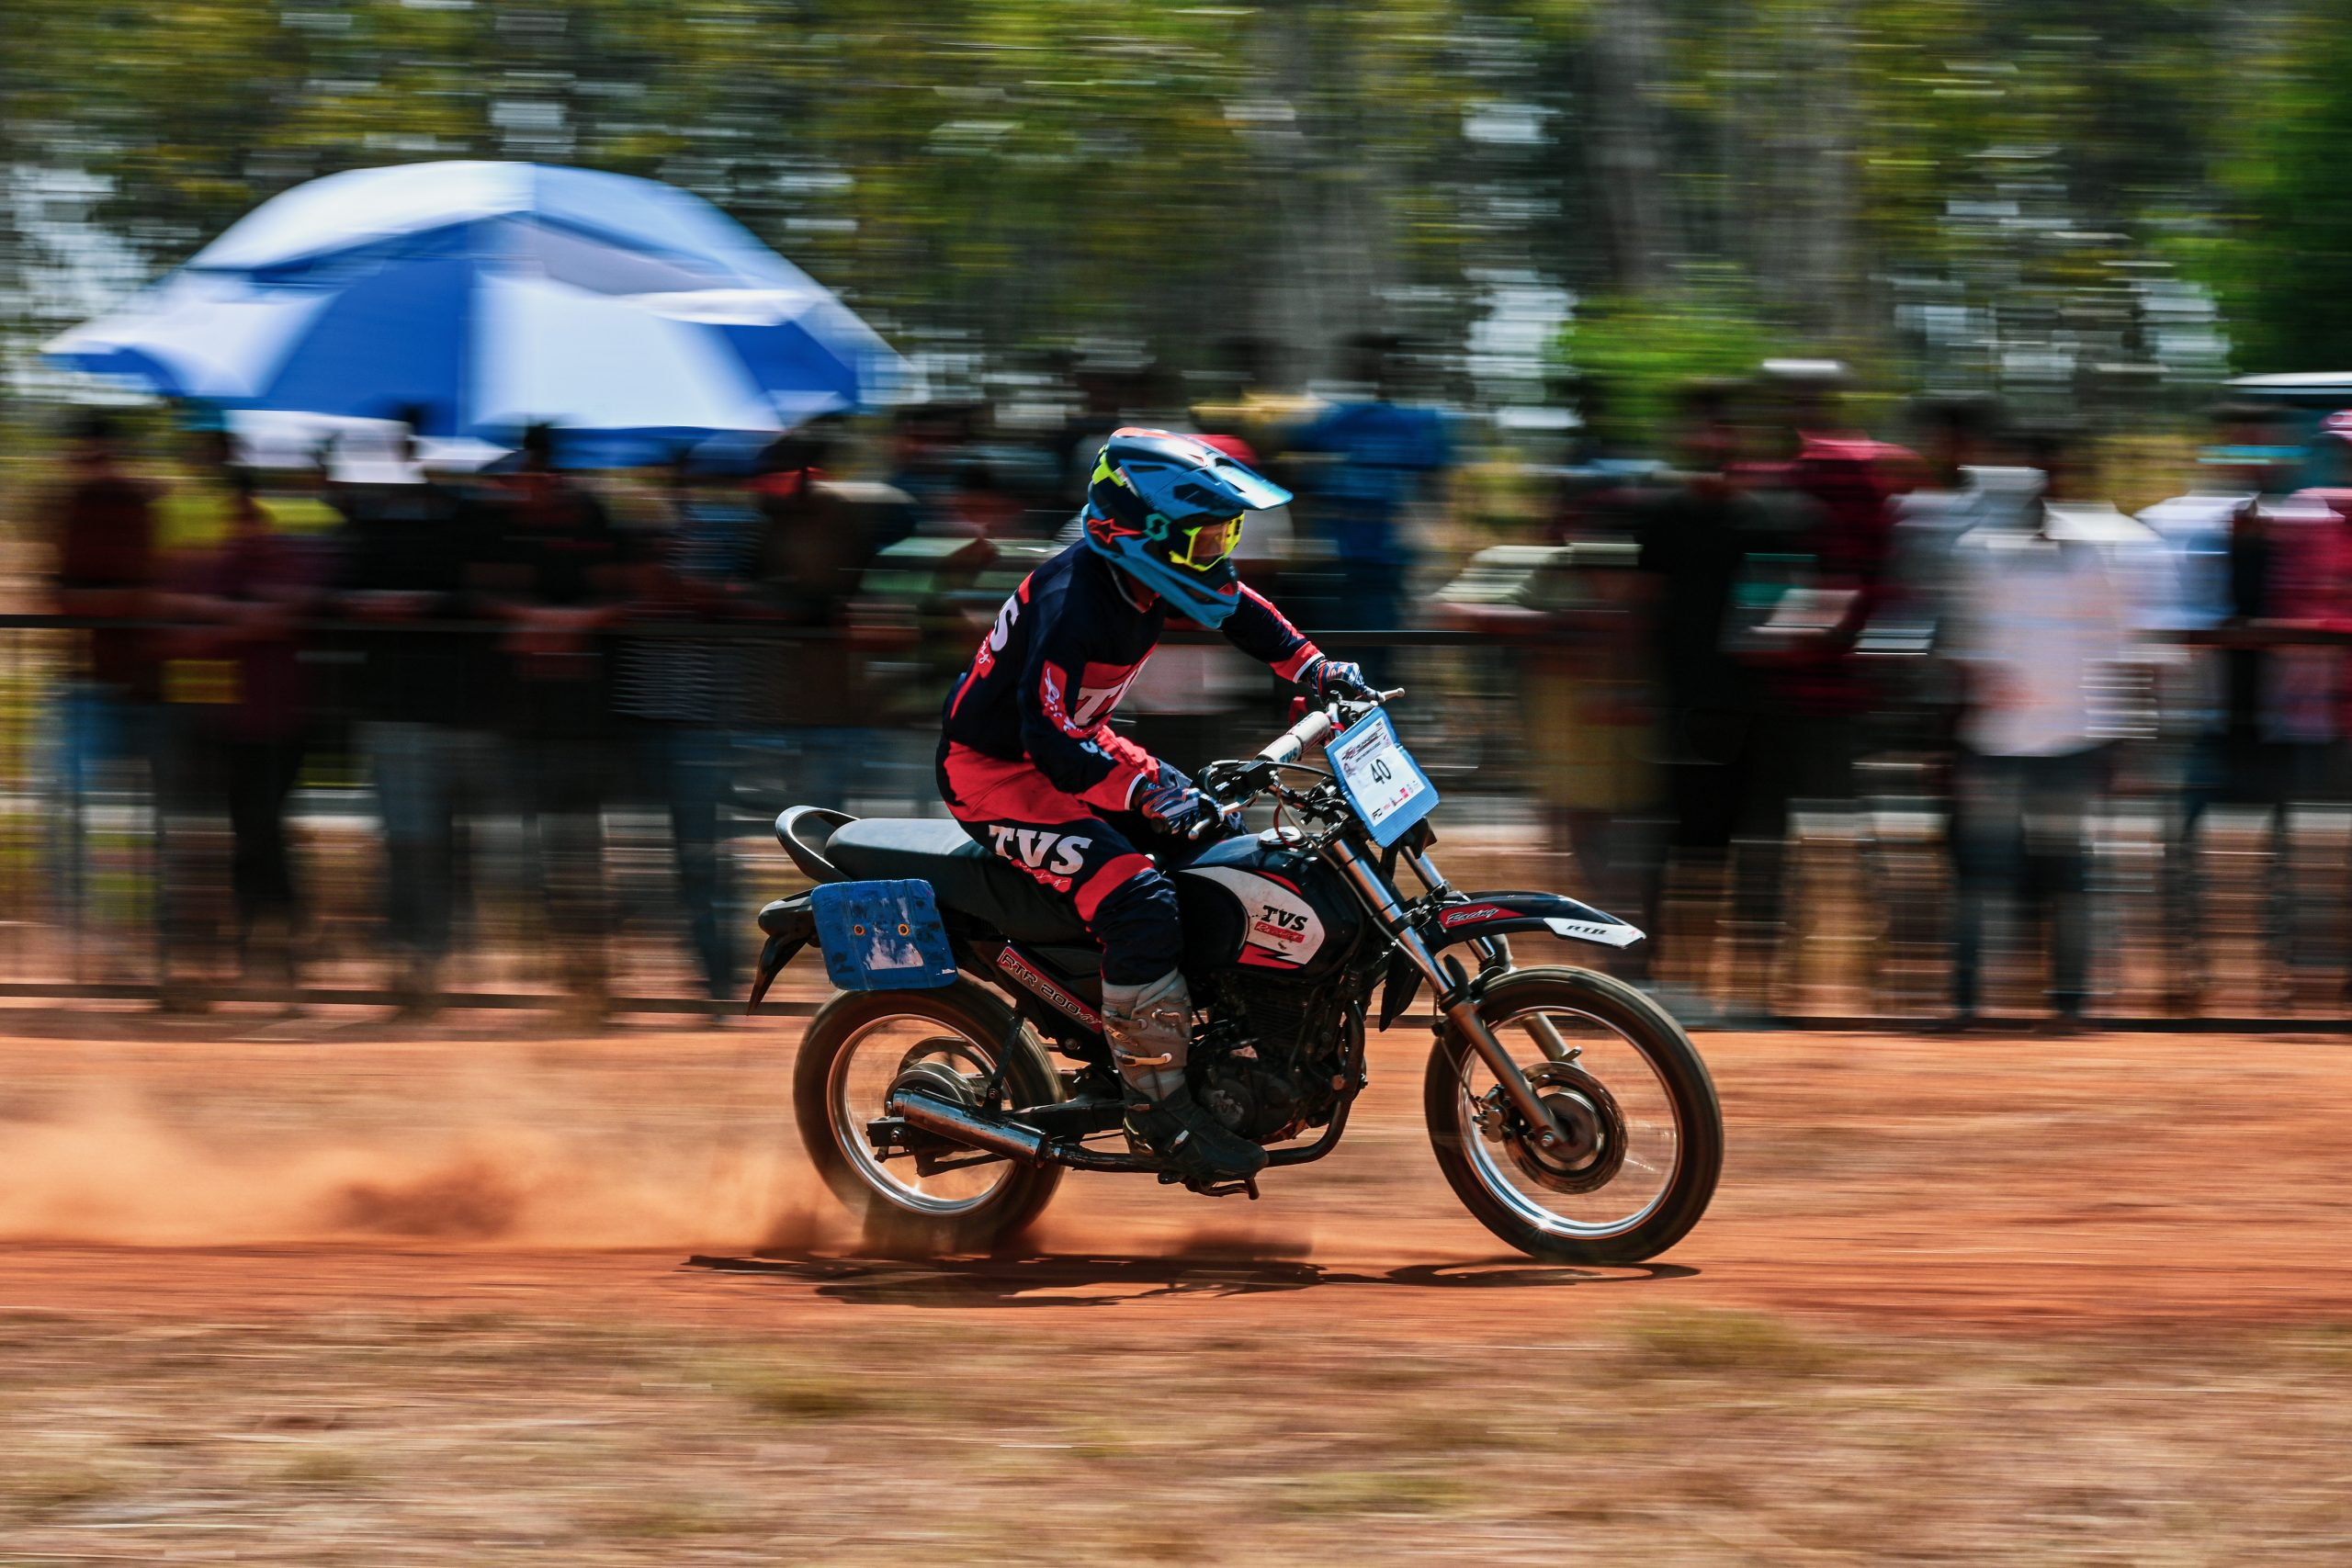 A bike rider performing dirk biking